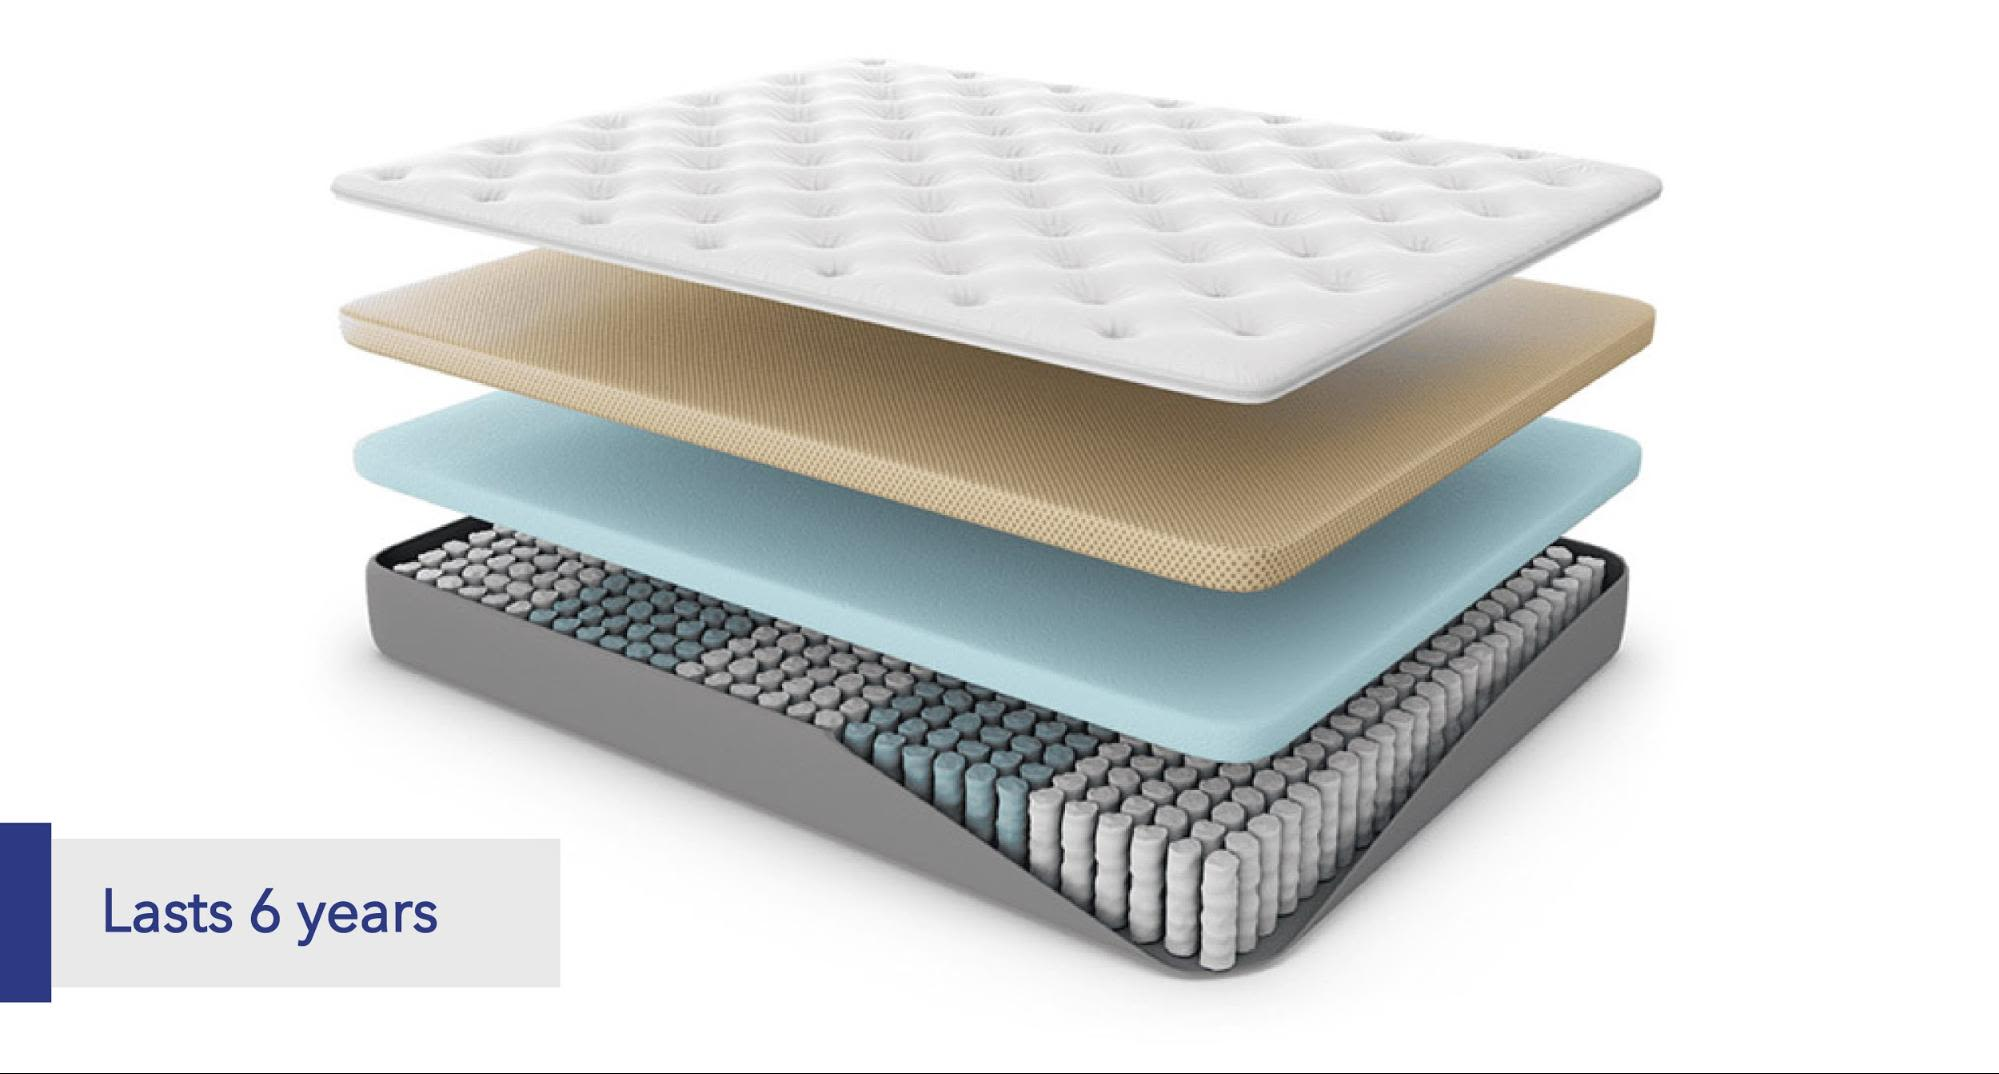 Hybrid mattresses last 6 years